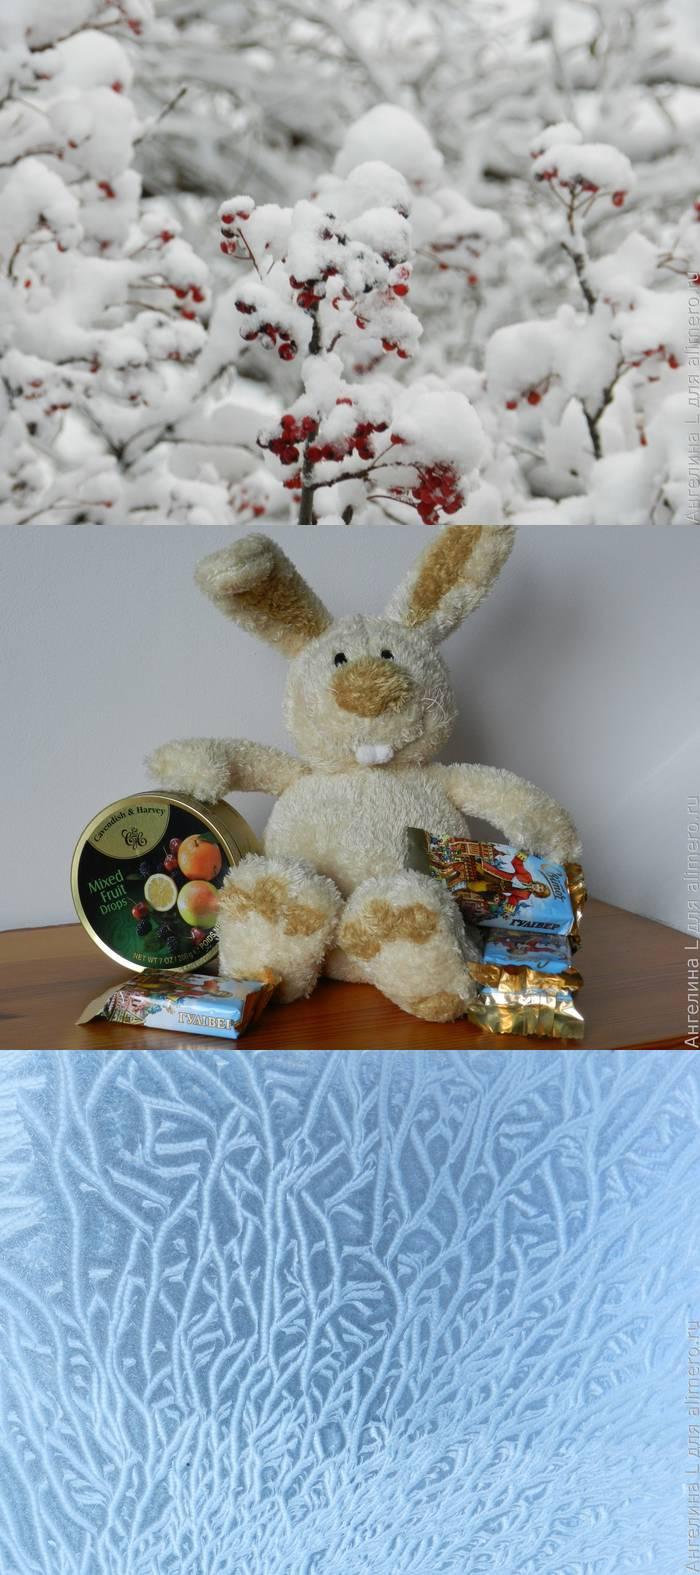 Снегурочка — ударница предновогоднего труда!